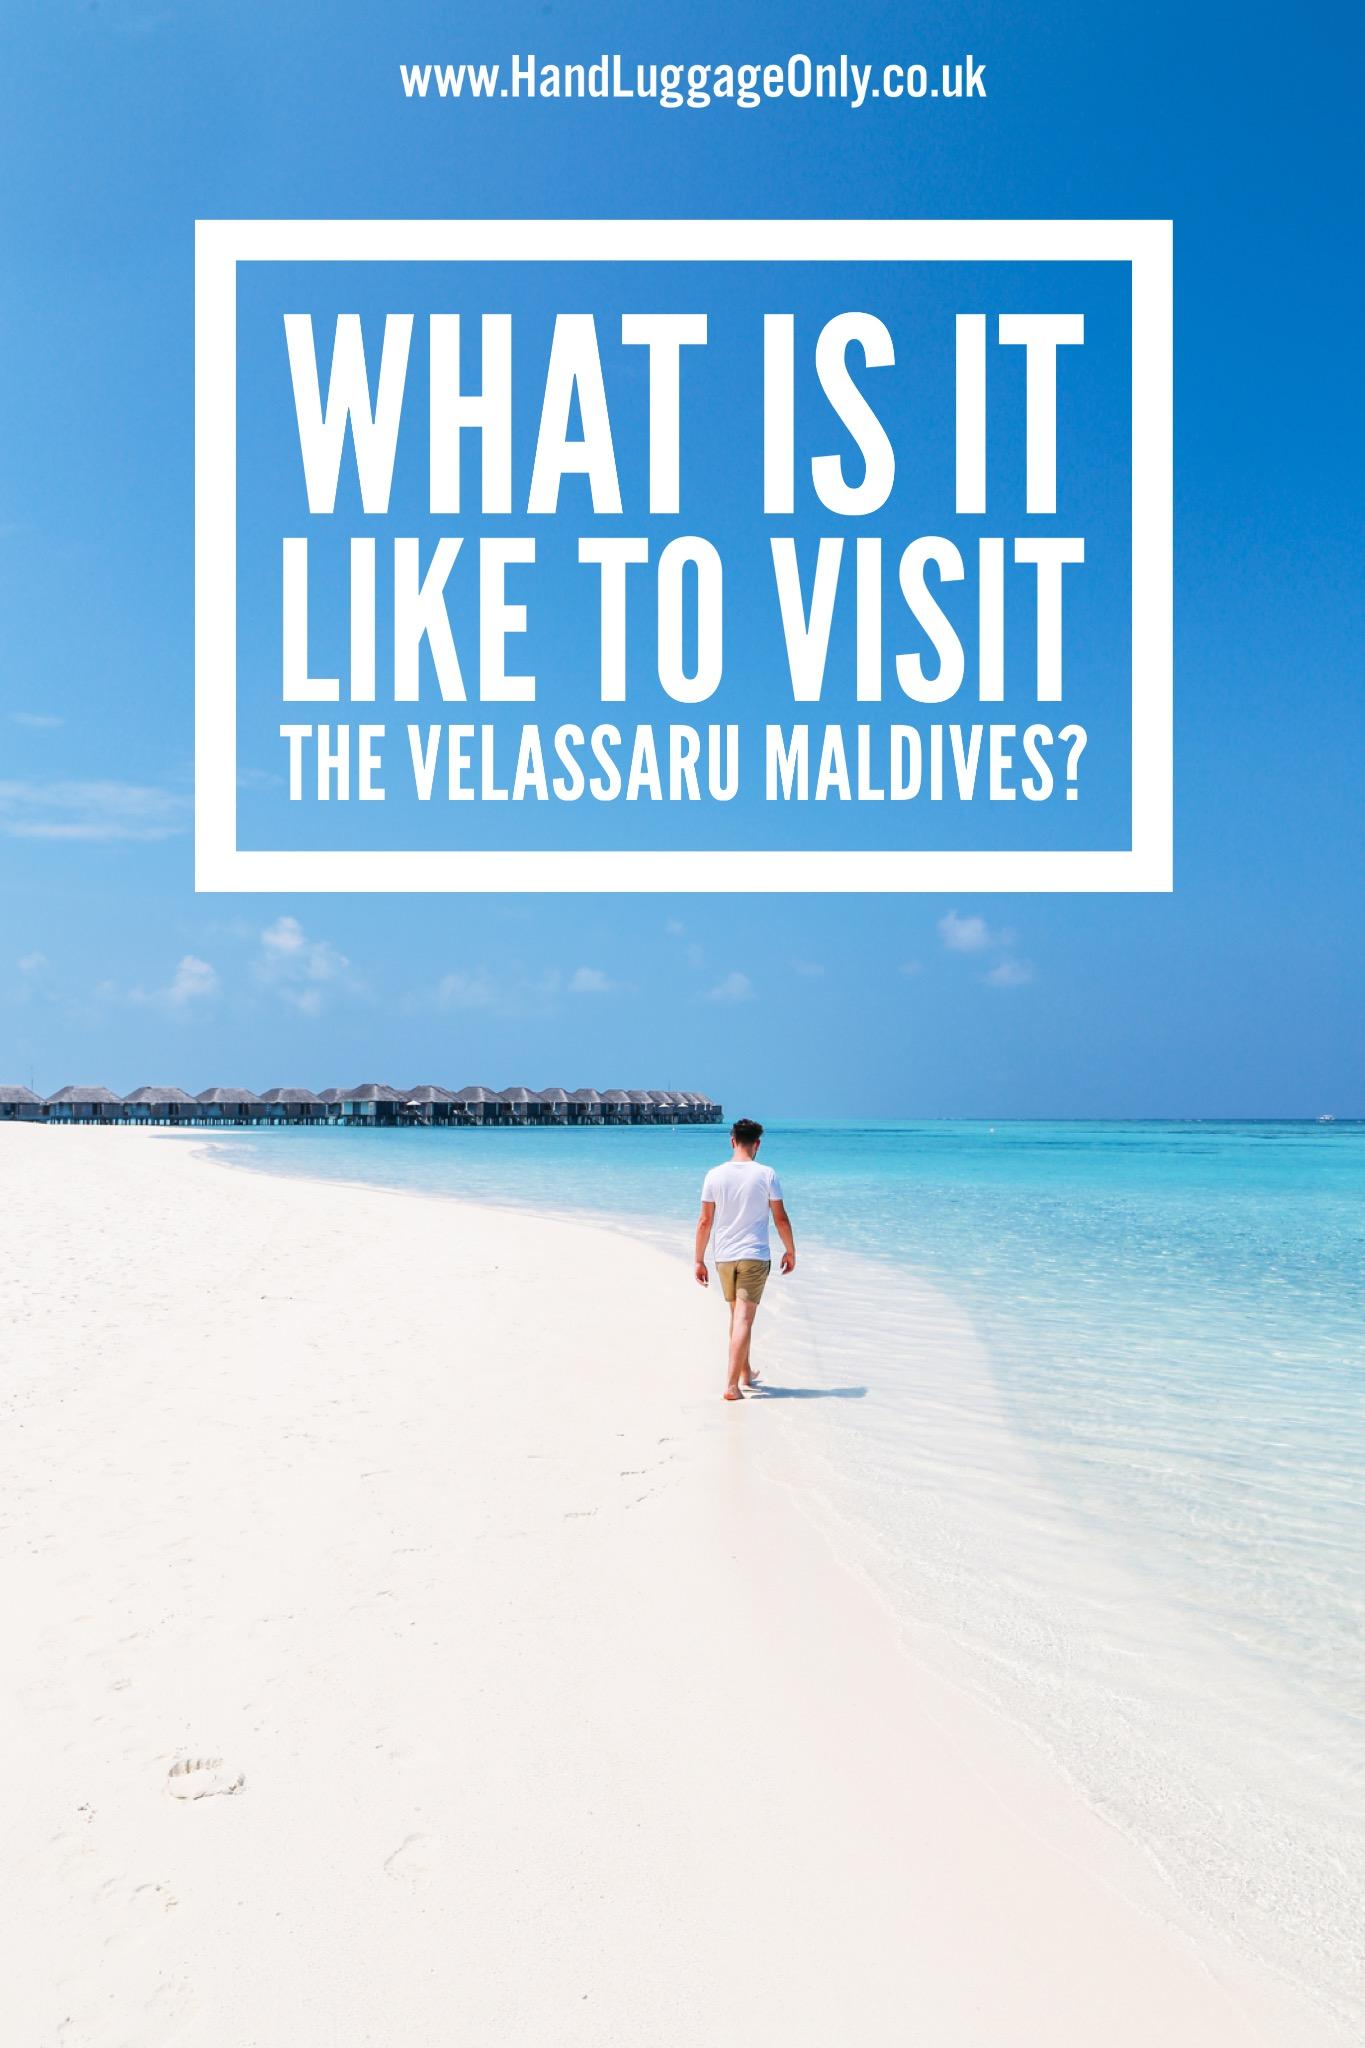 Sunny Days At The Velassaru Maldives (2)